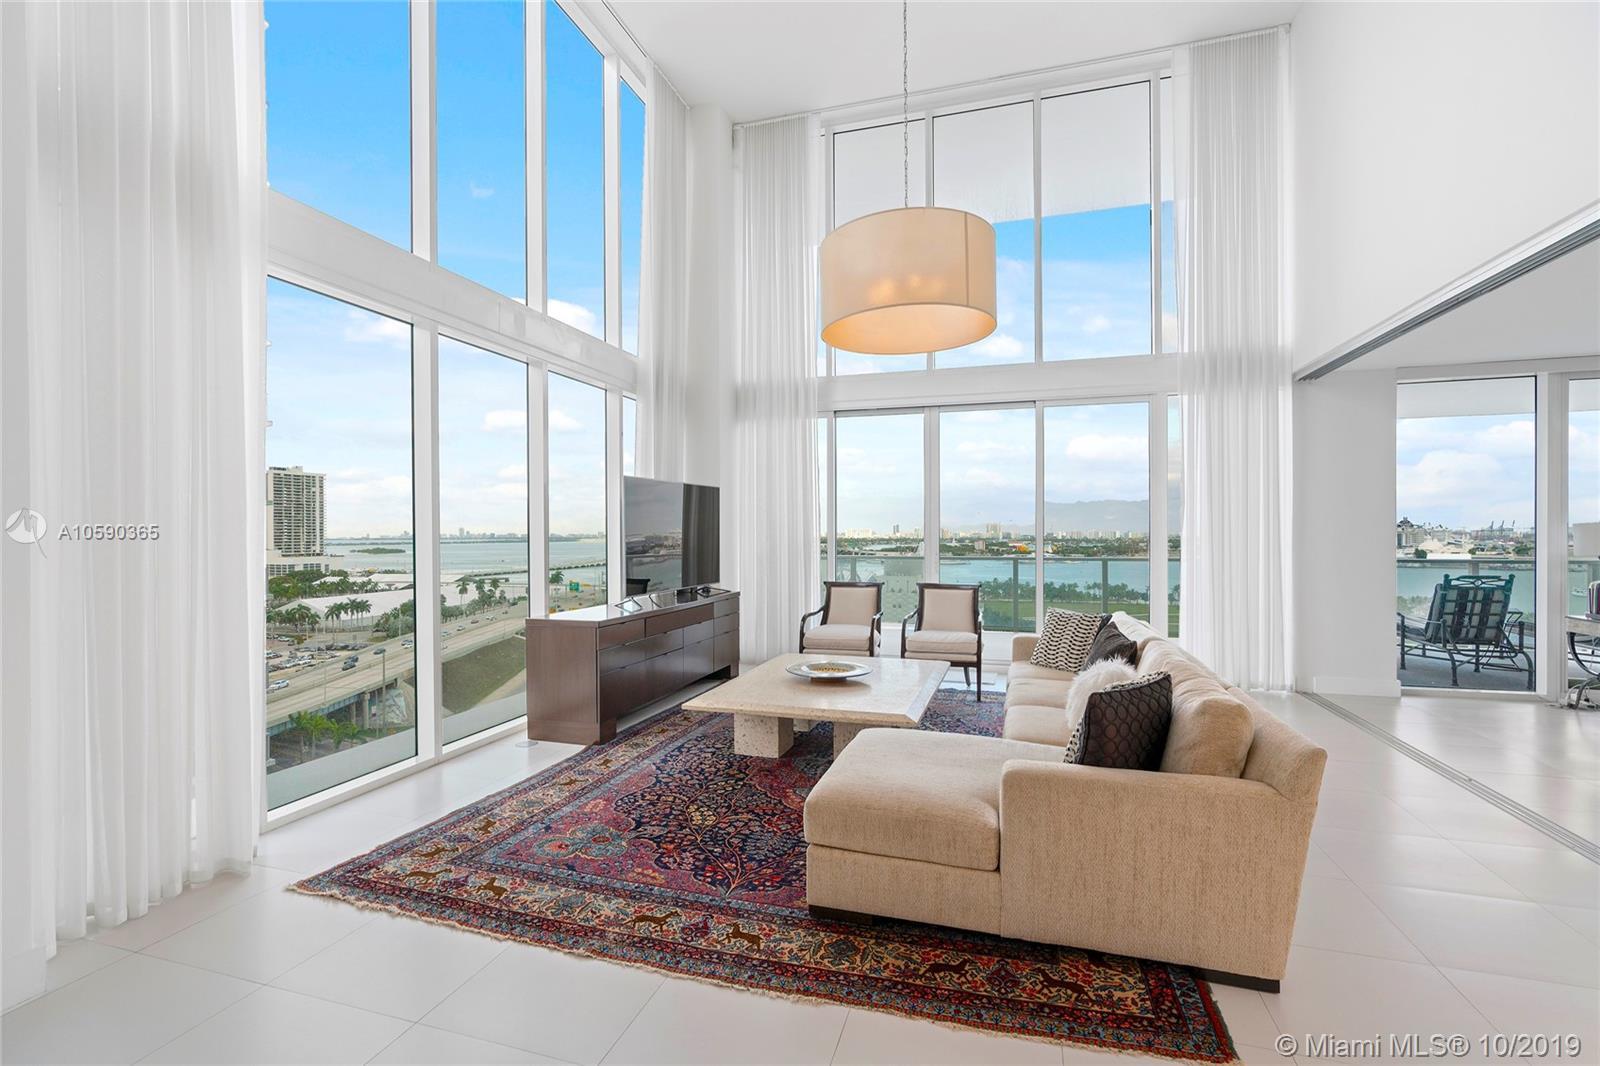 1040 Biscayne Blvd, 1004 - Miami, Florida